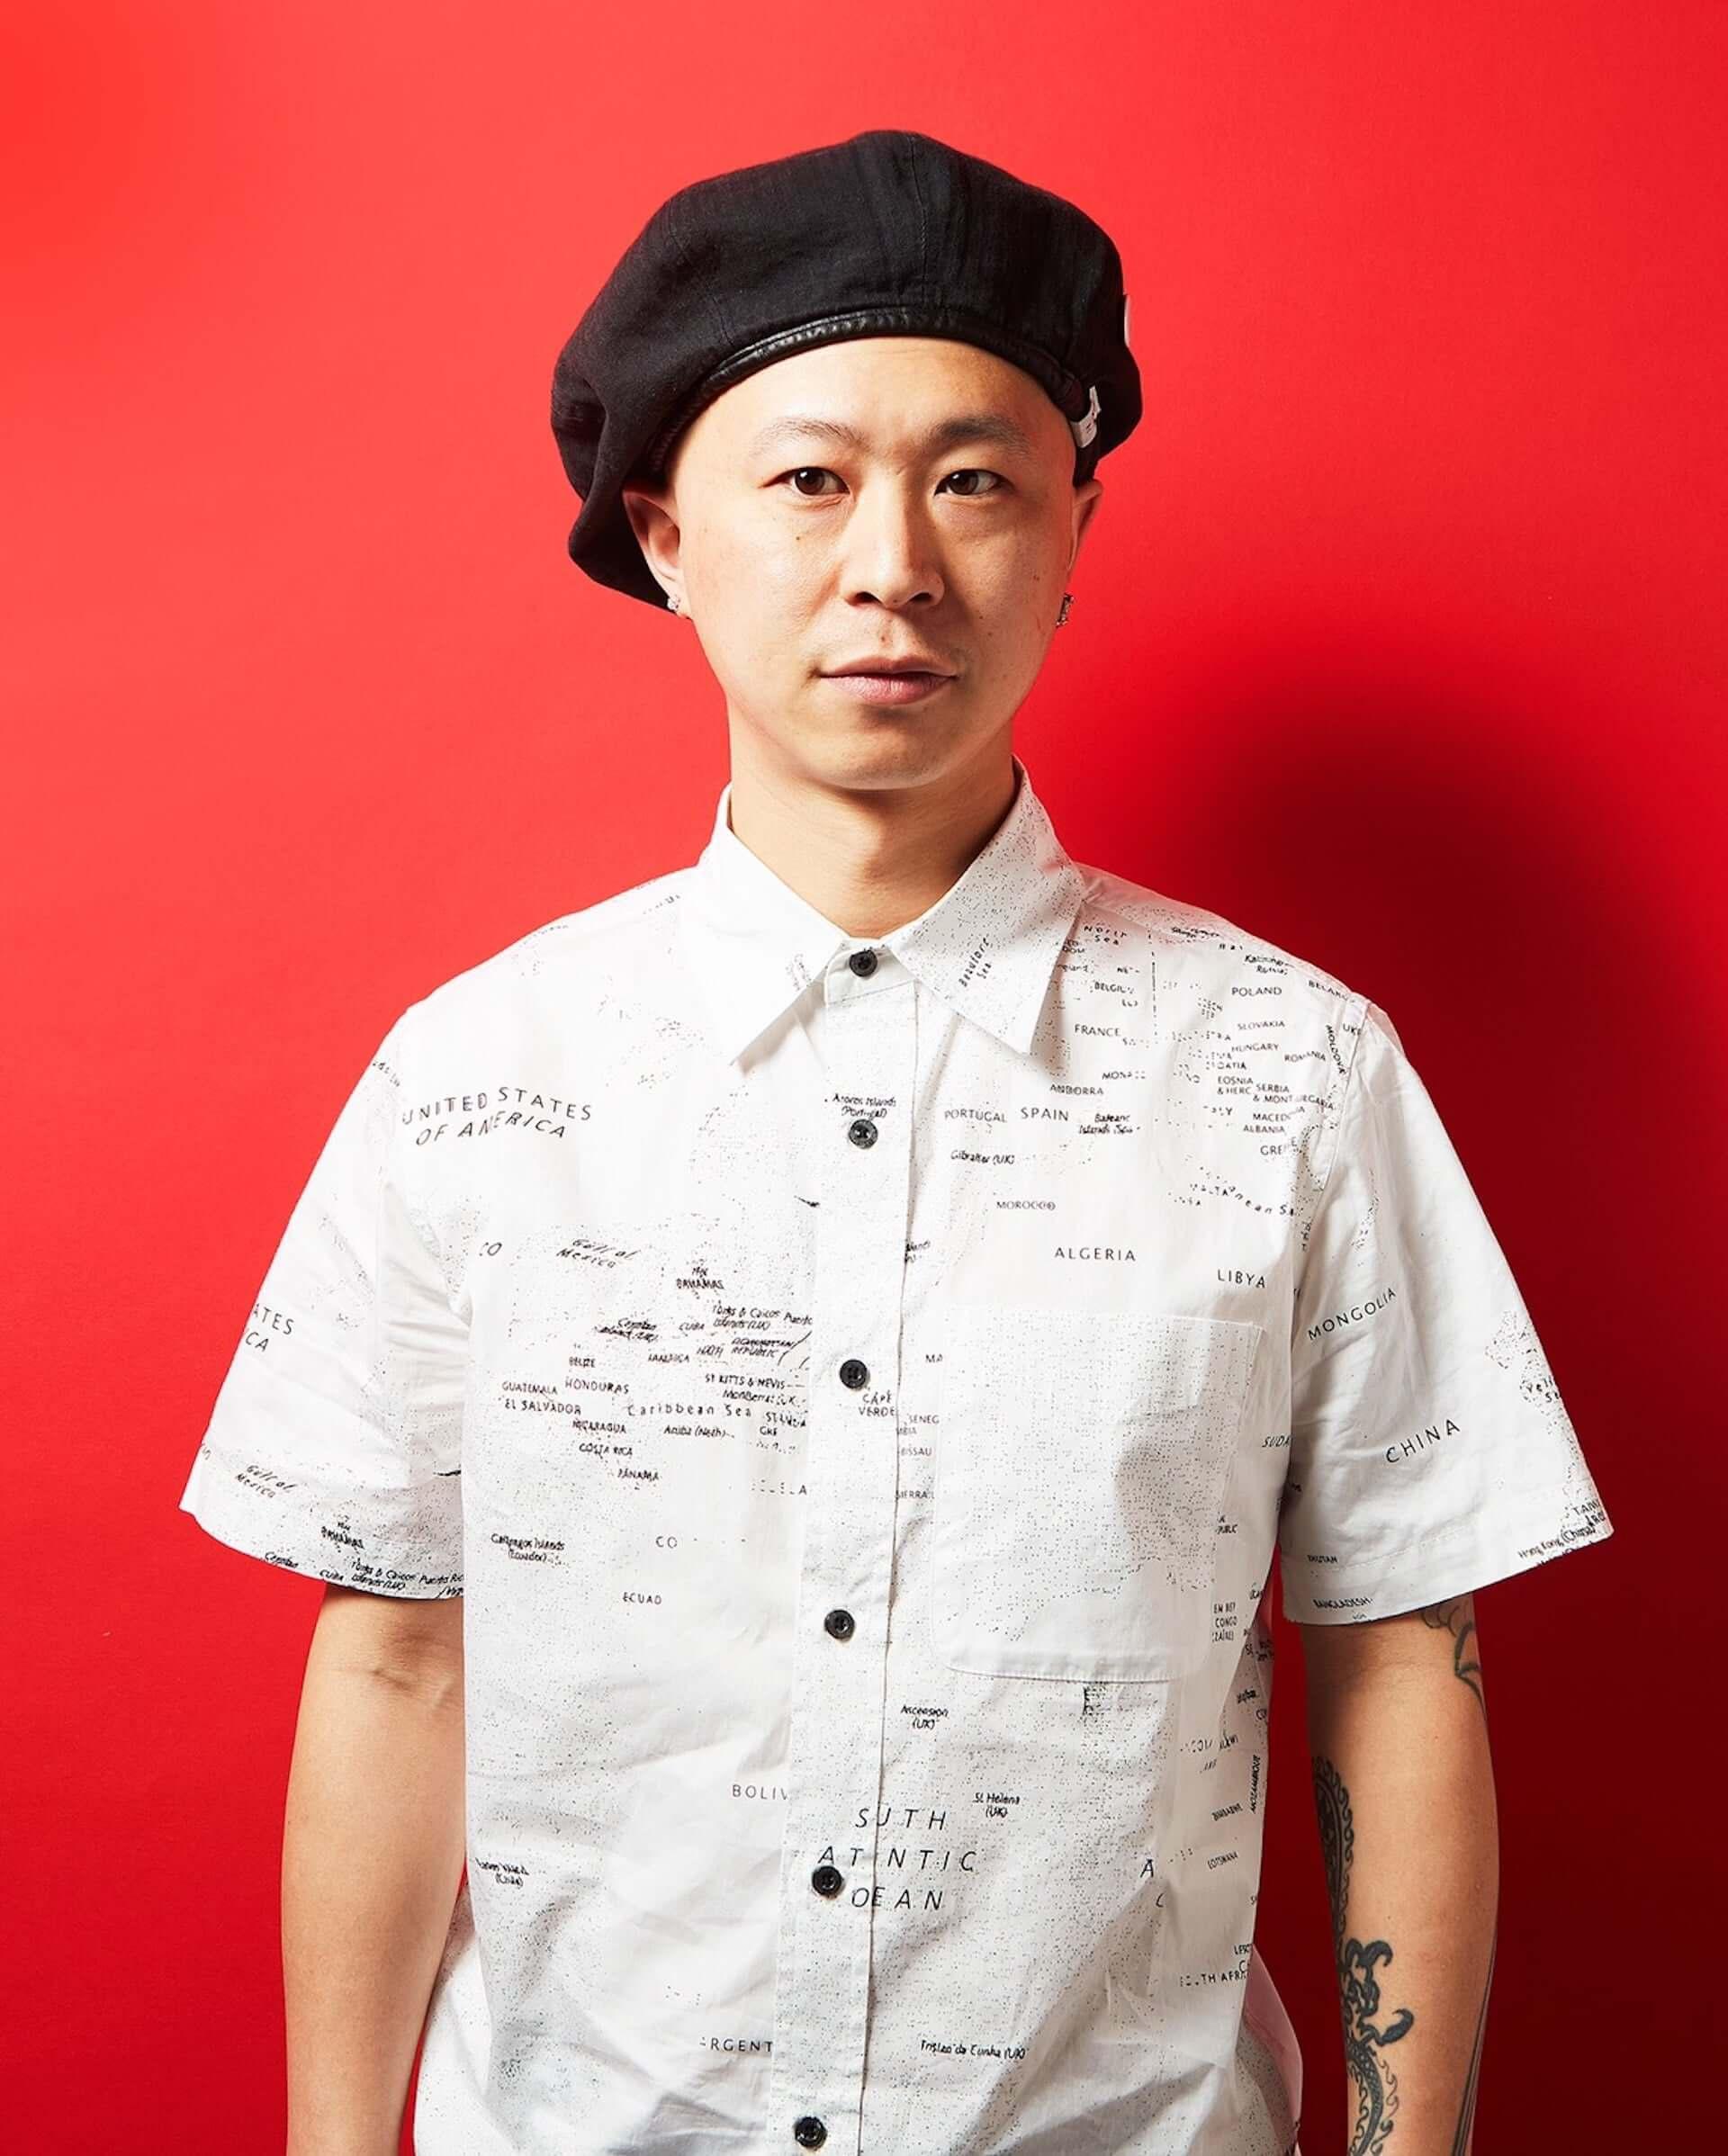 DJ BAKU主催のジャンルレスパーティー<KAIKOO -邂逅->第2弾にRITTO x Olive Oil、kZmらが登場 music190909_kaikoo_3-1920x2396